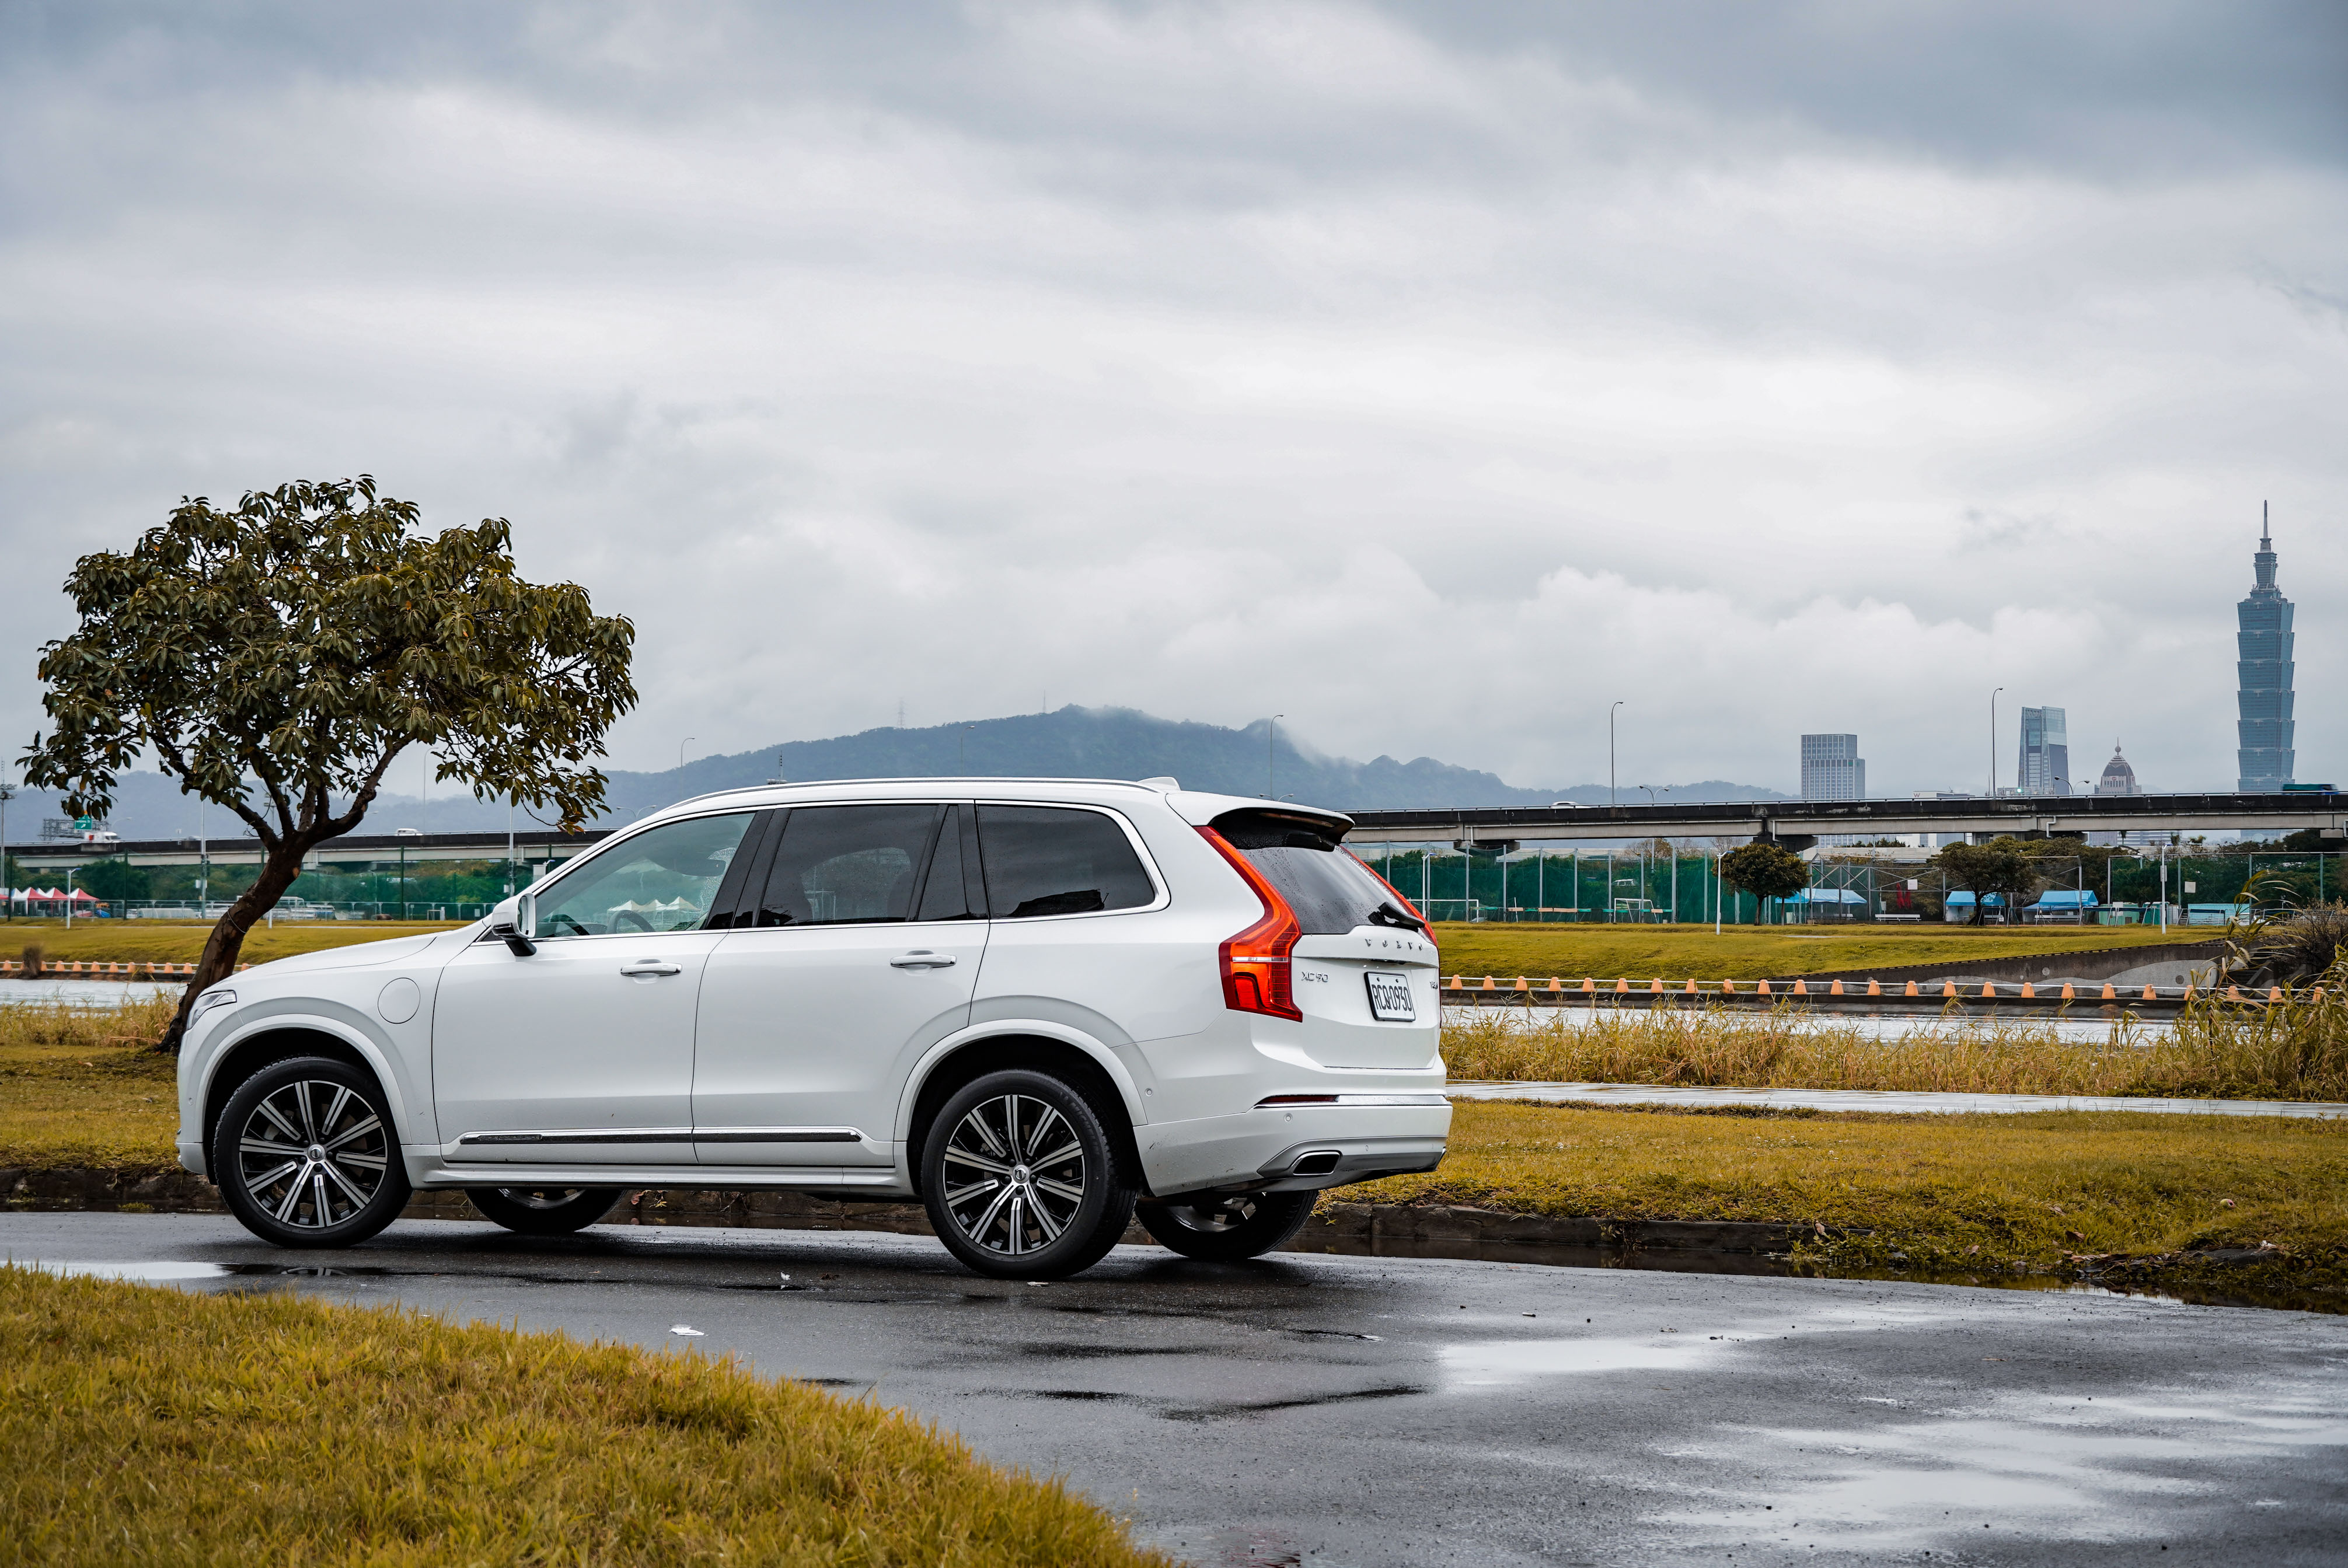 Volvo XC90 提供 D5、T5、T6、T8 等四種動力,搭配 Momentum、Inscription、R-Design、Excellence 四種車型。